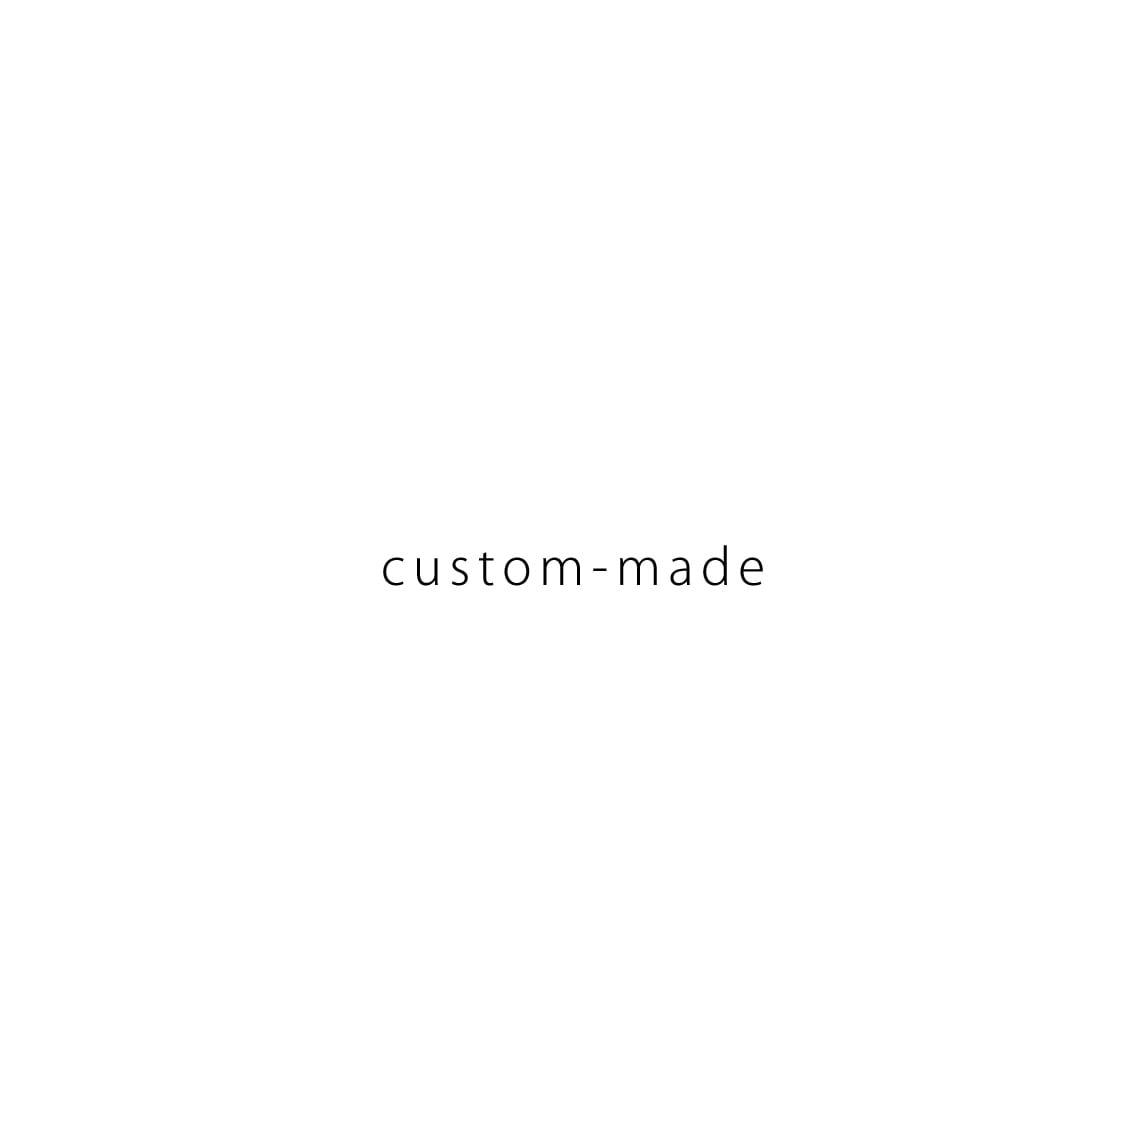 E.Kさま order品・Full custom-made 特注オリジナル額縁 原画